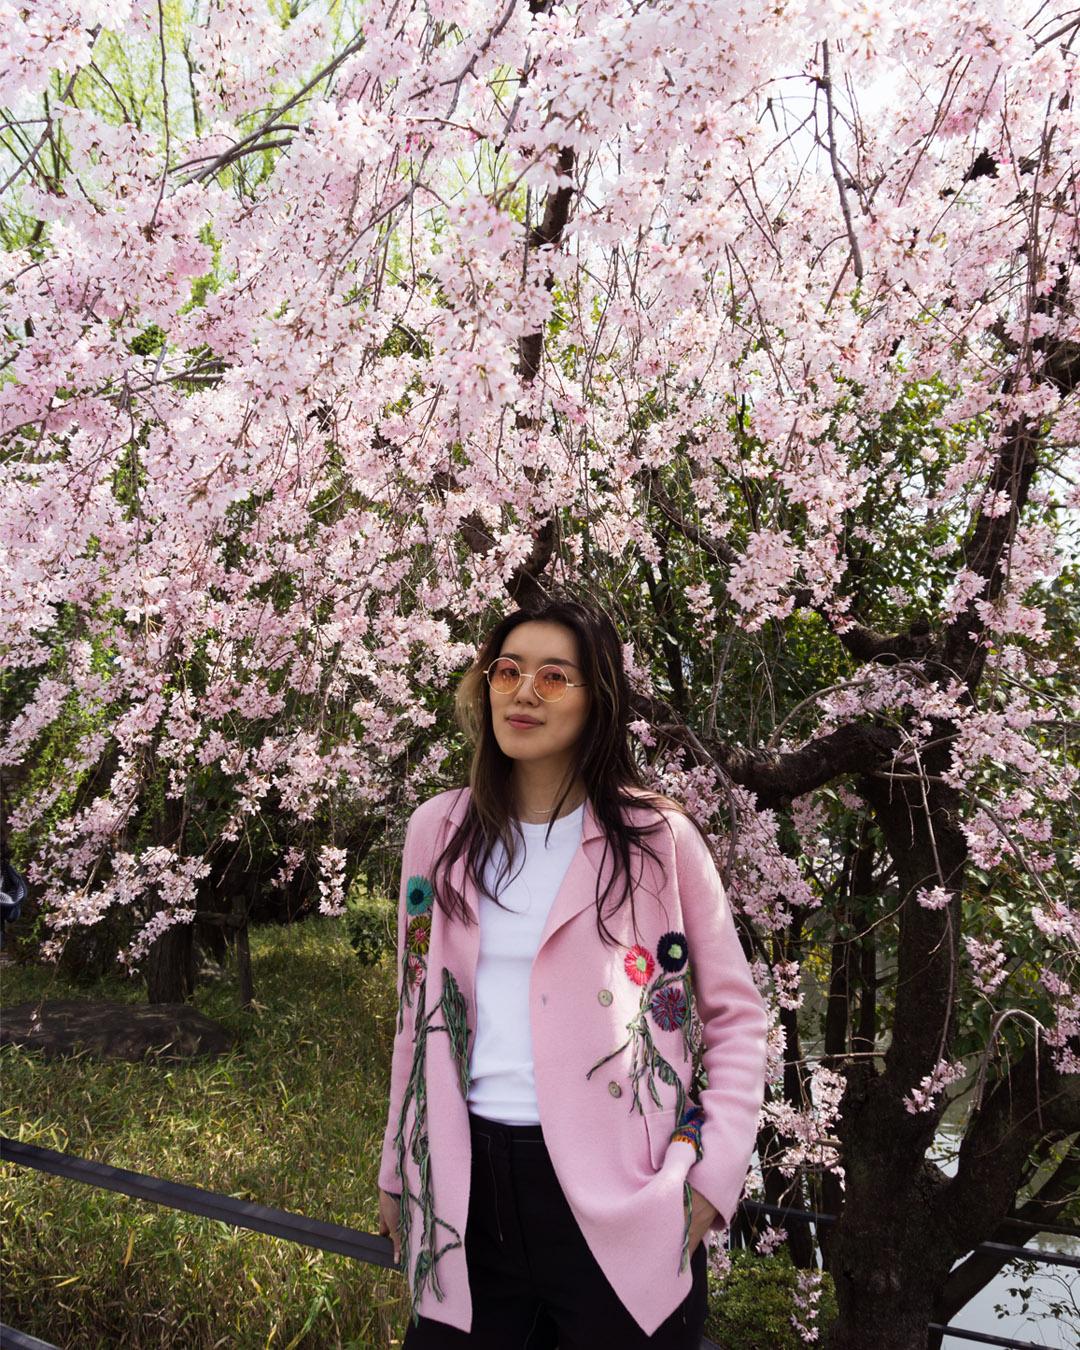 MANDKHAI in tokyo - light pink embroidered suit blazer